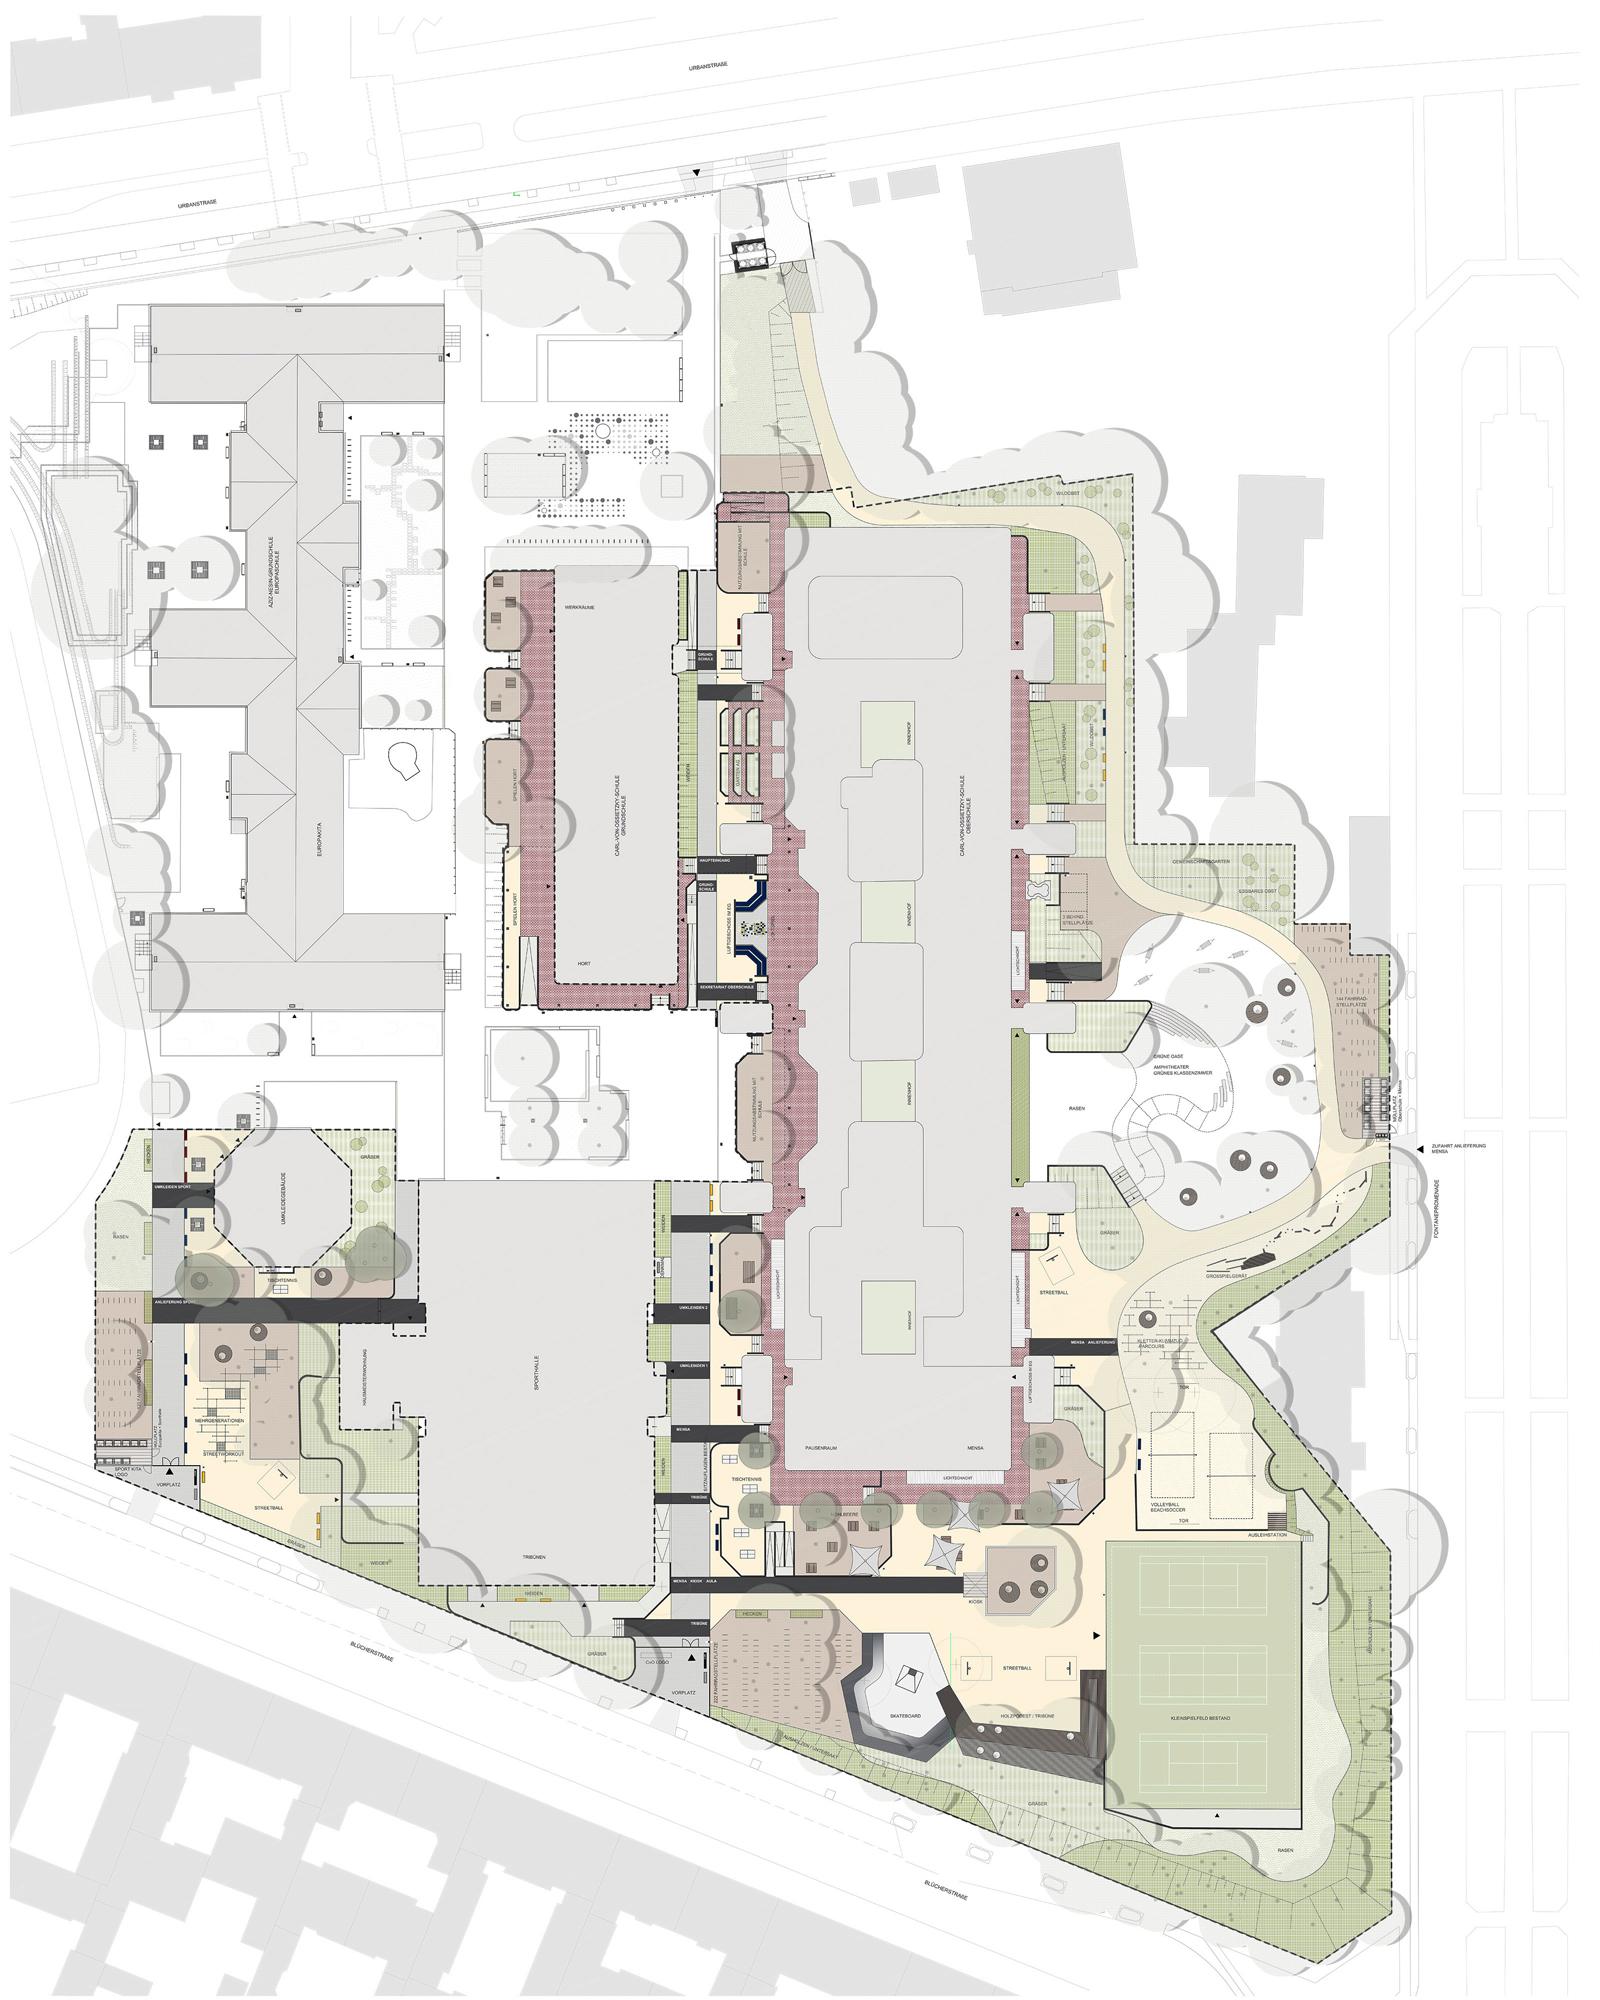 Lageplan-Schulehof-Pausenhof-Wettbewerbe-Berlin-Landschaftarchitekturbuero-Armbruster